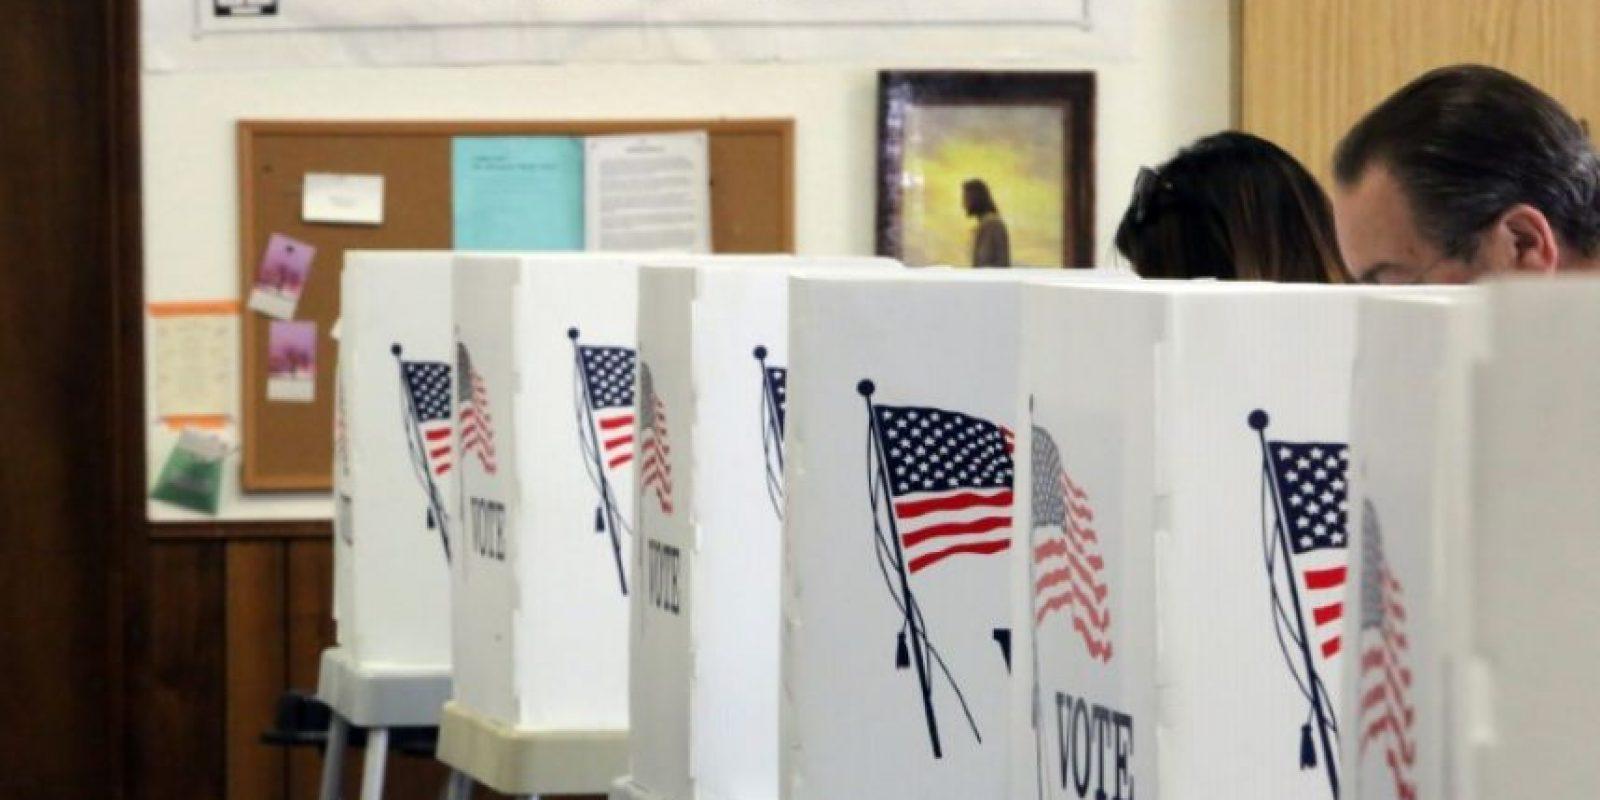 Votantes en una iglesia metodista de Big Bear, California, el 8 de noviembre de 2016 Foto:Bill Wechter/afp.com